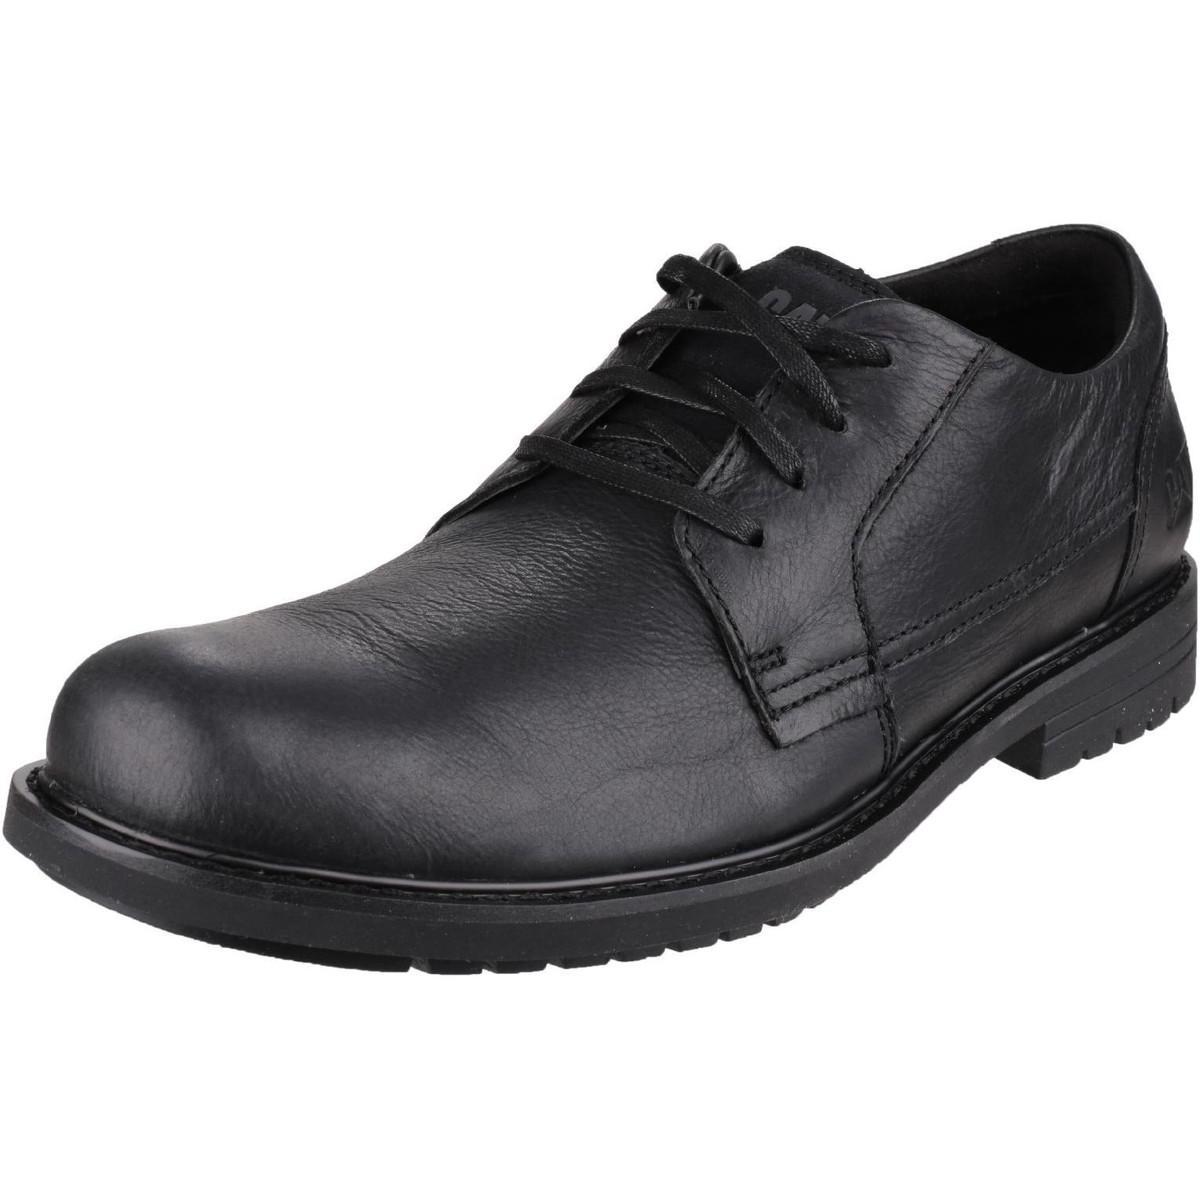 Caterpillar Leather Cason Shoe in Black for Men